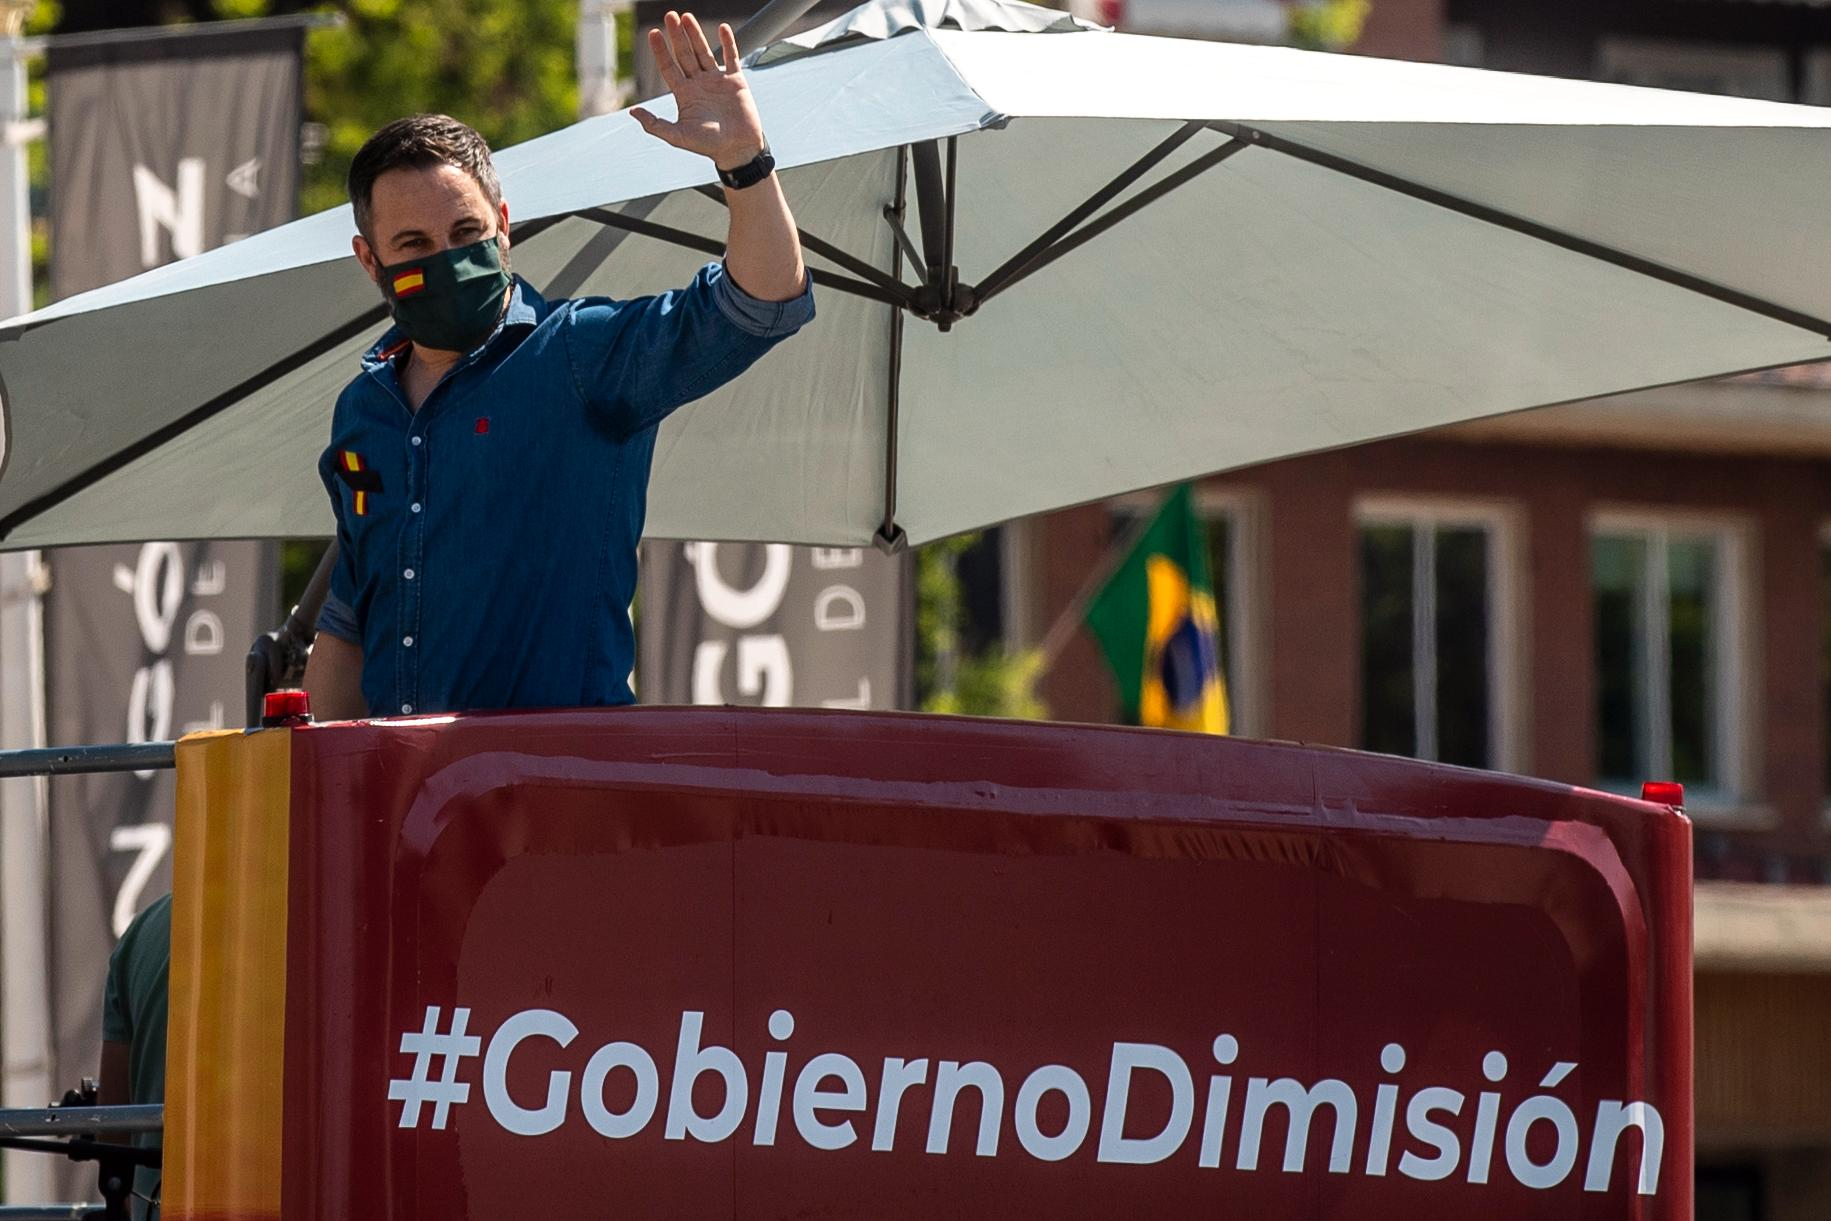 Santiago Abascal, partiledare för högerextrema Vox, under en protest i Madrid.